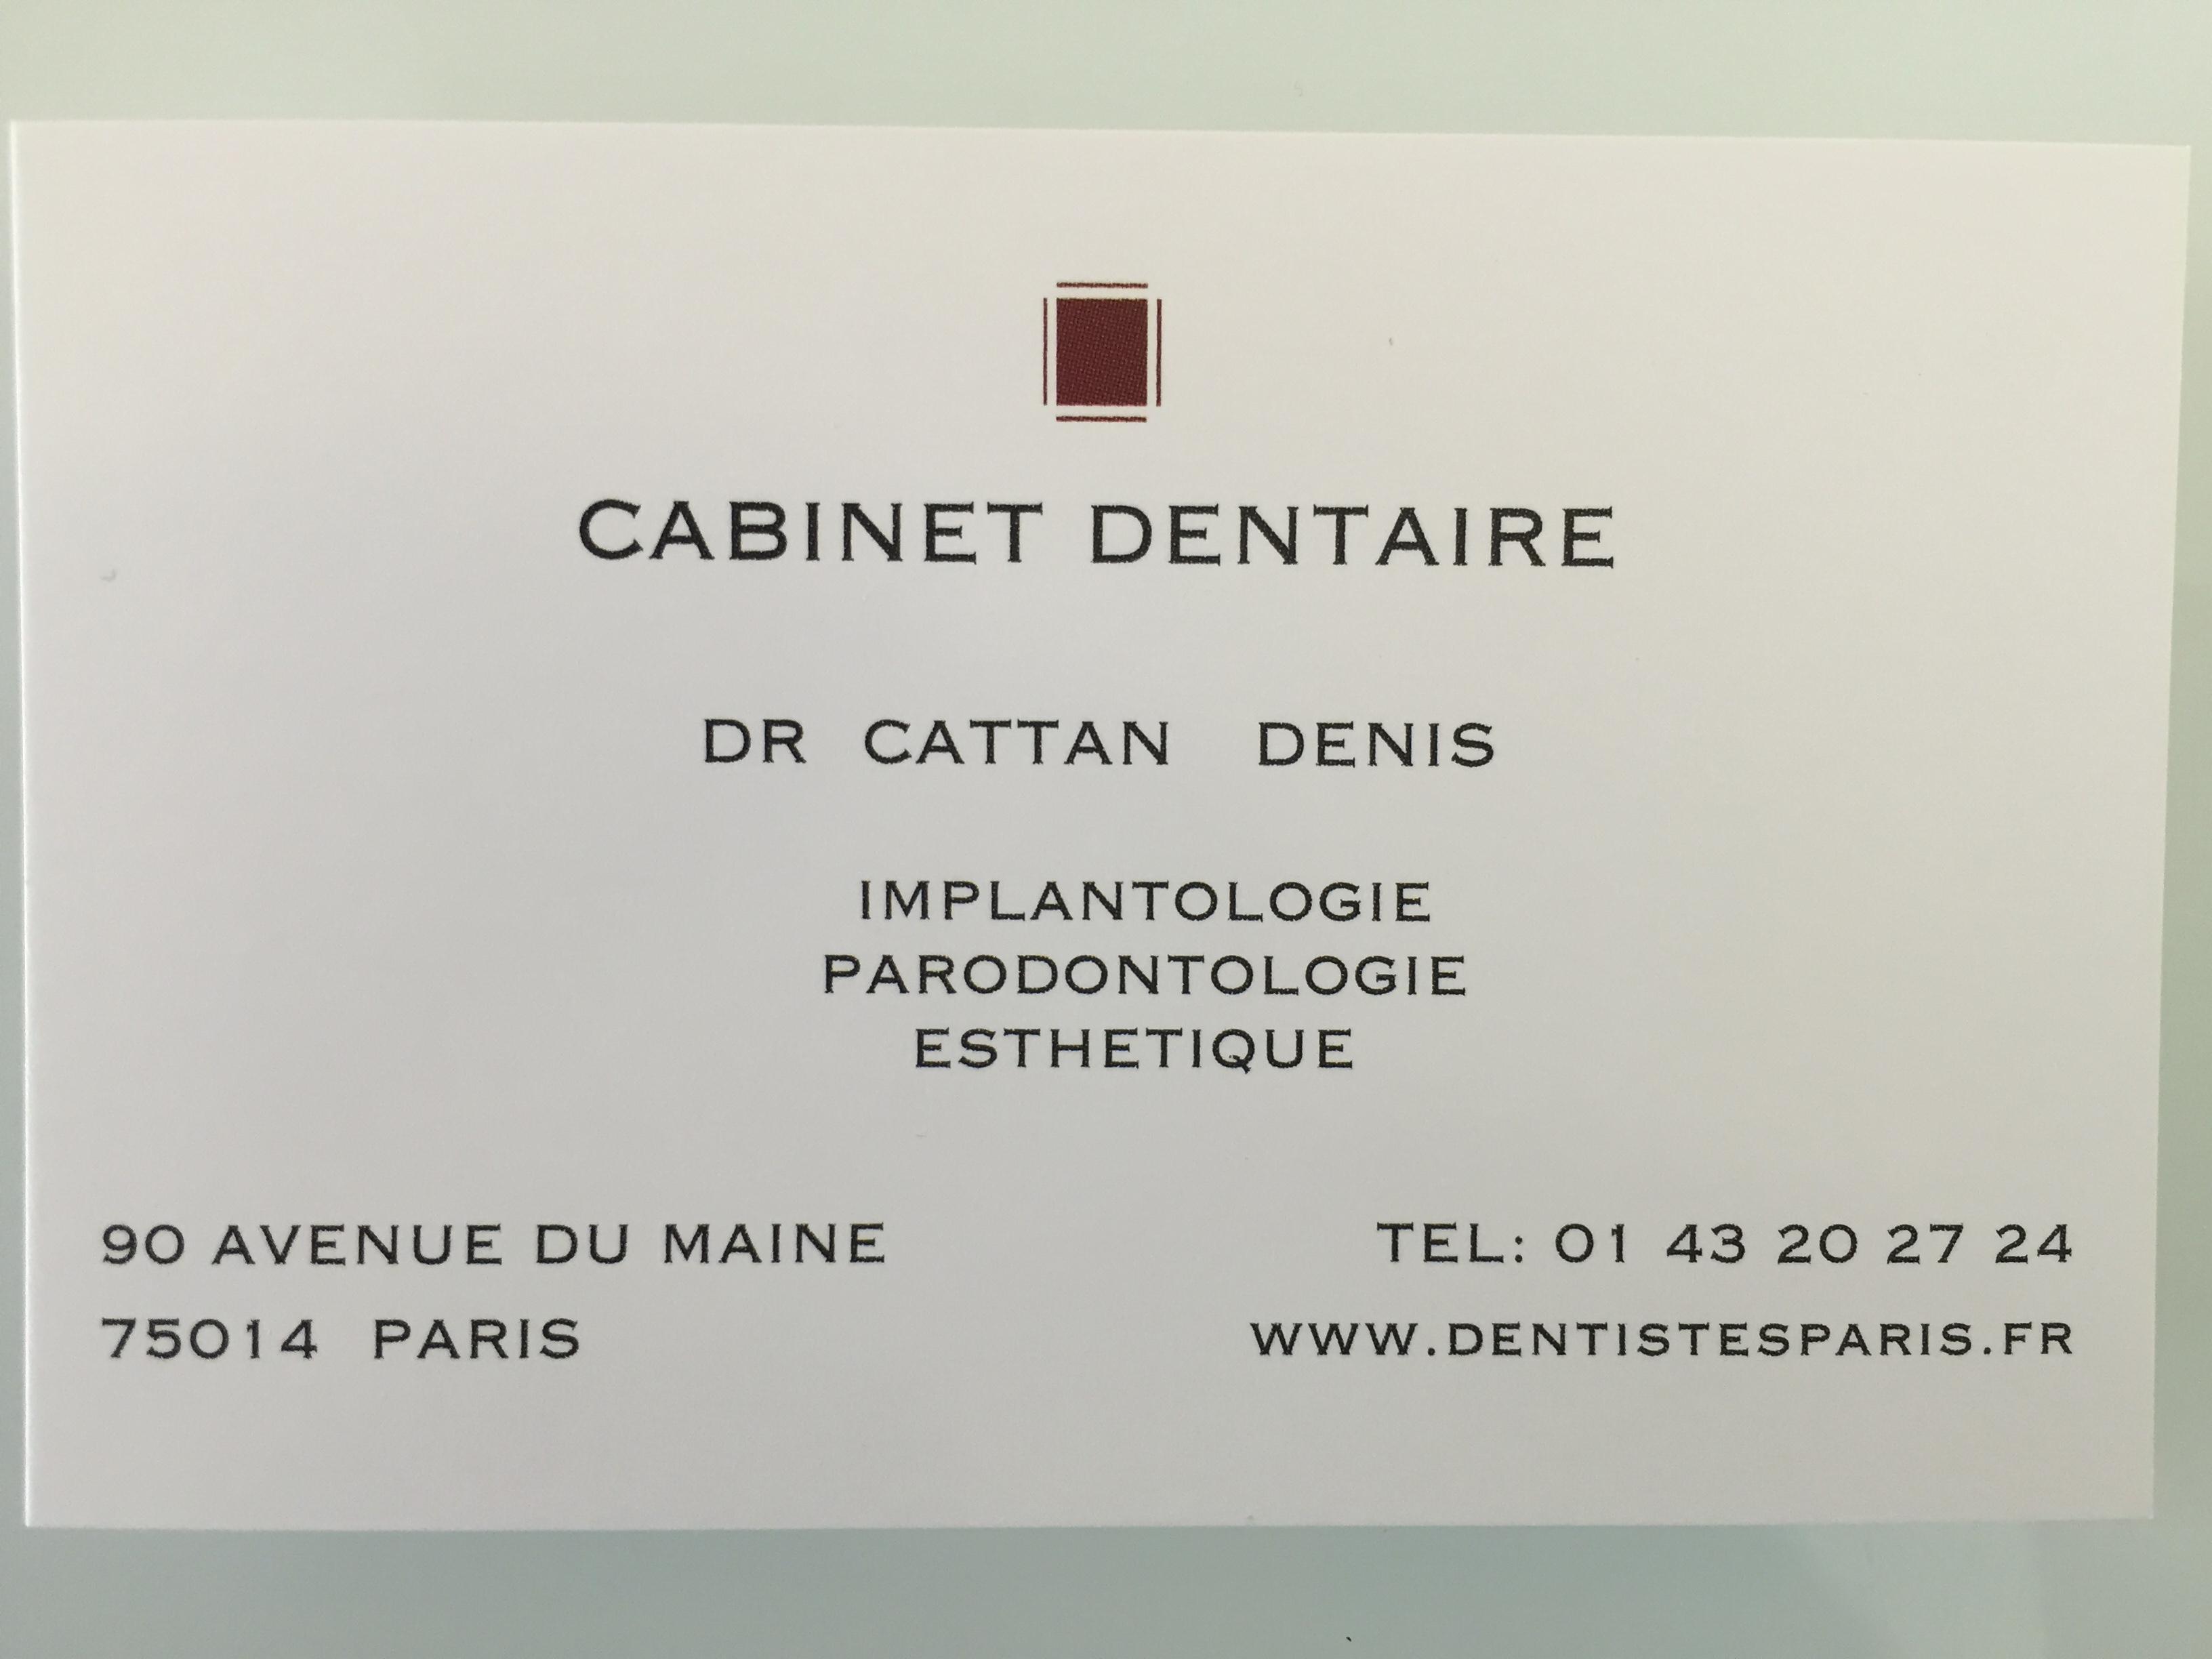 DOCTEUR CATTAN DENIS CHIRURGIEN DENTISTE